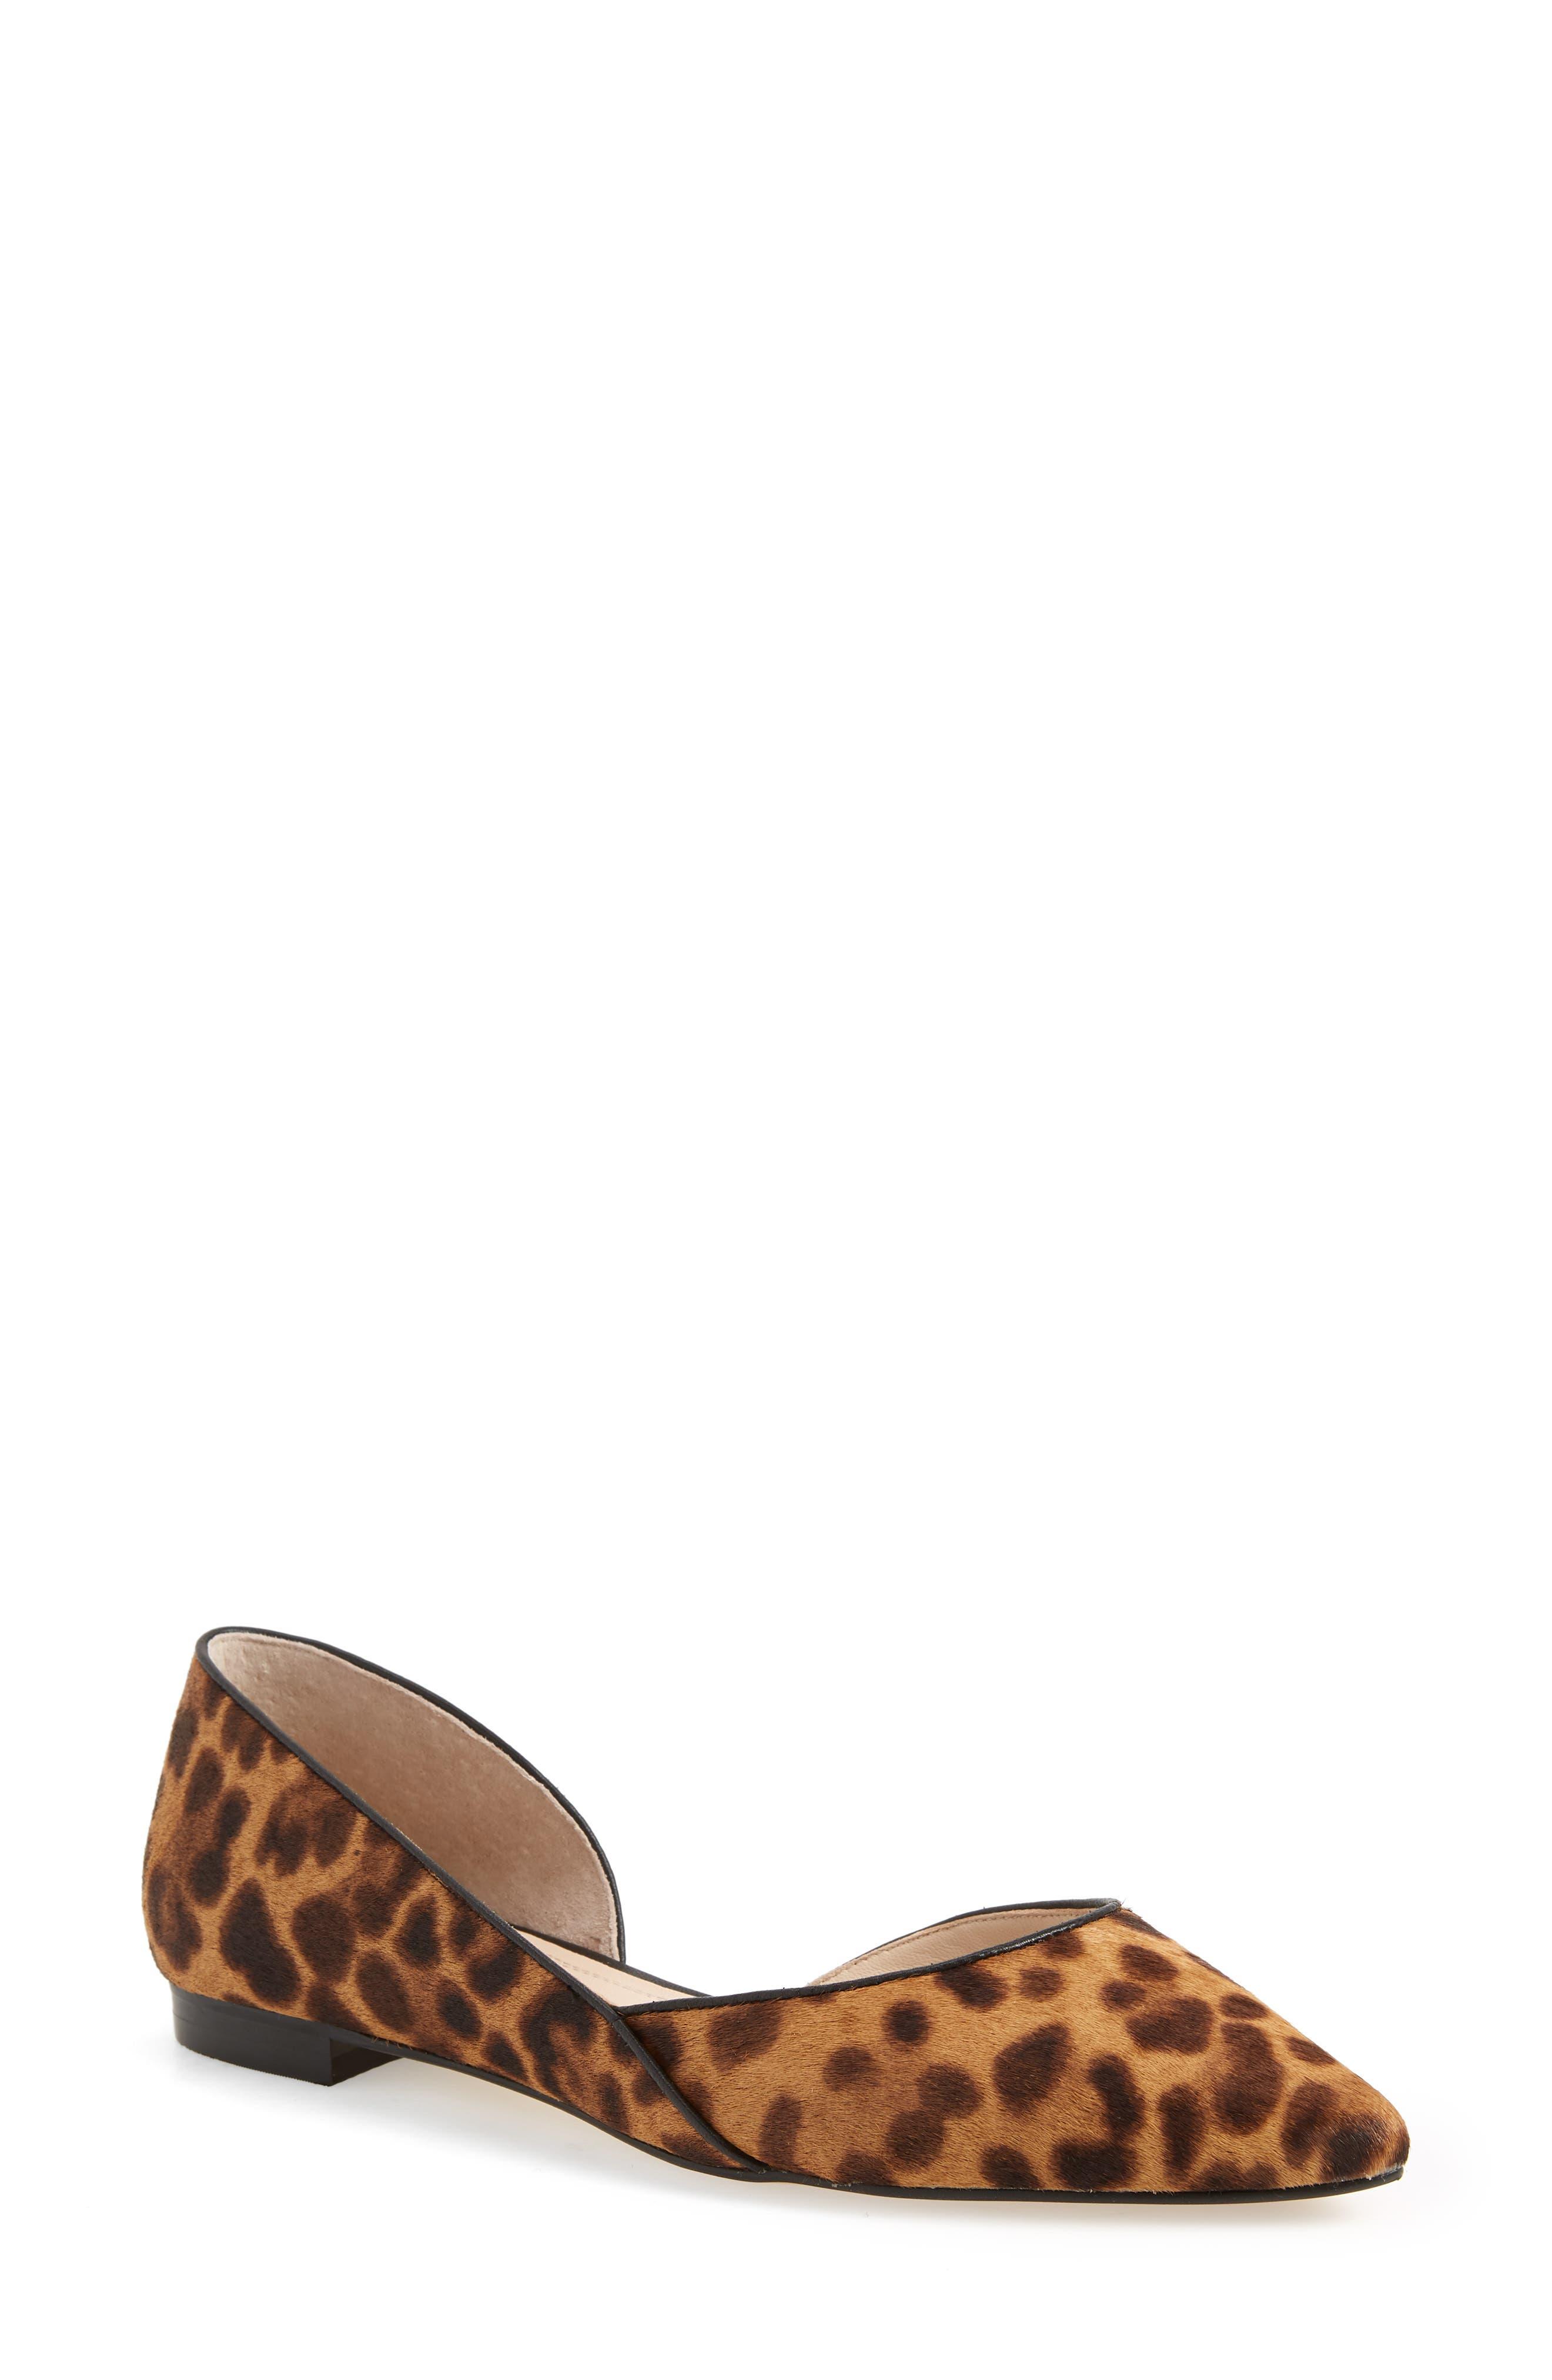 Sunny Genuine Calf Hair Flat,                             Main thumbnail 1, color,                             Leopard Calf Hair